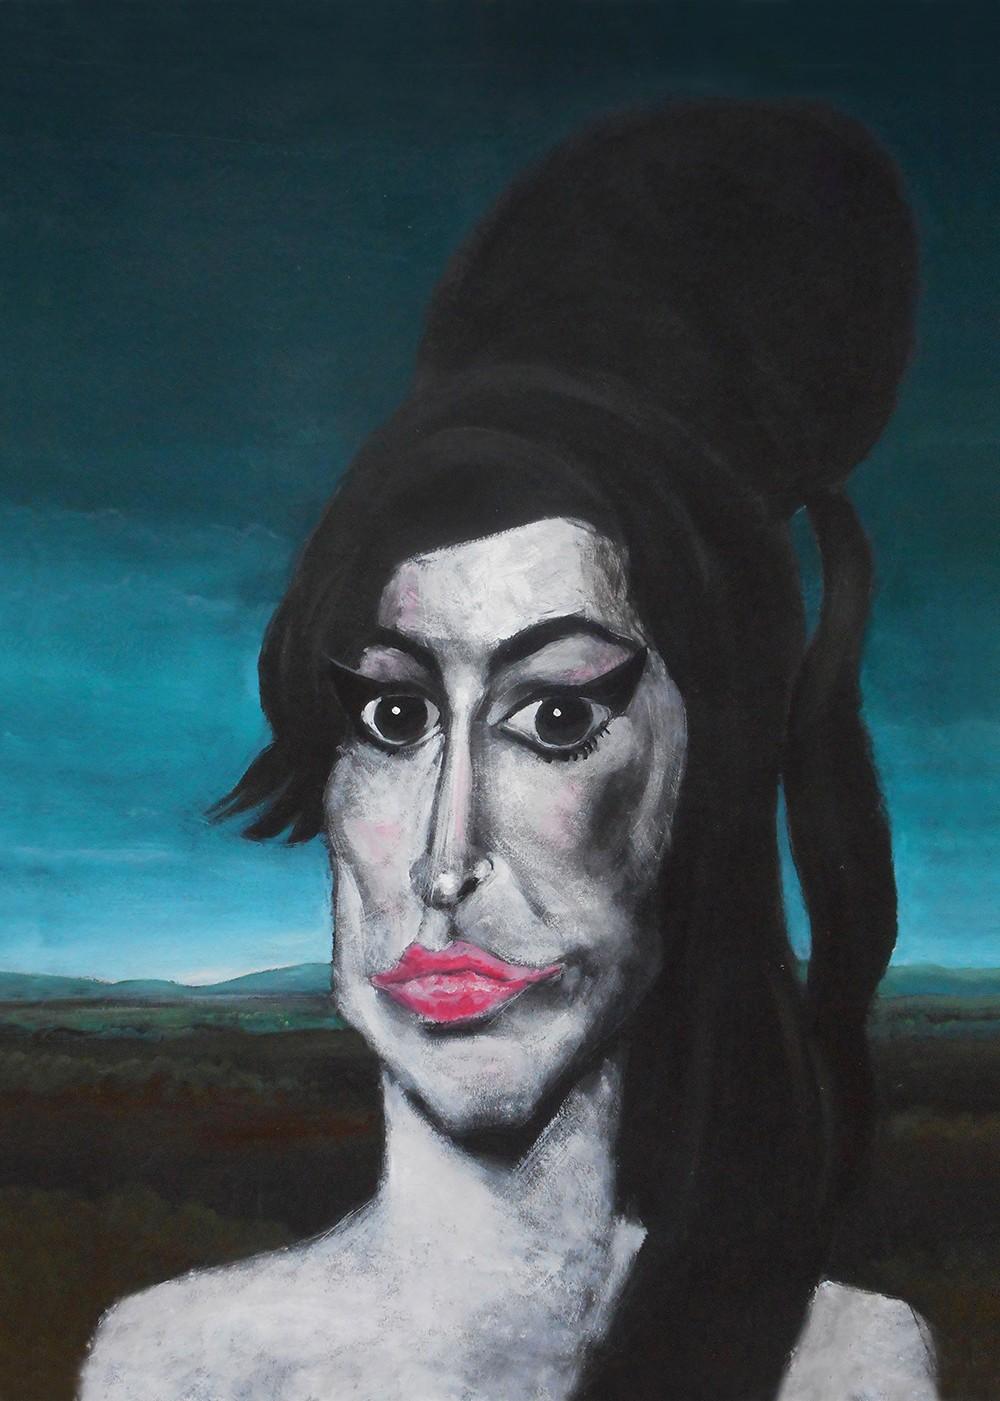 Michael _Albers_Michael Albers Amy Winehouse